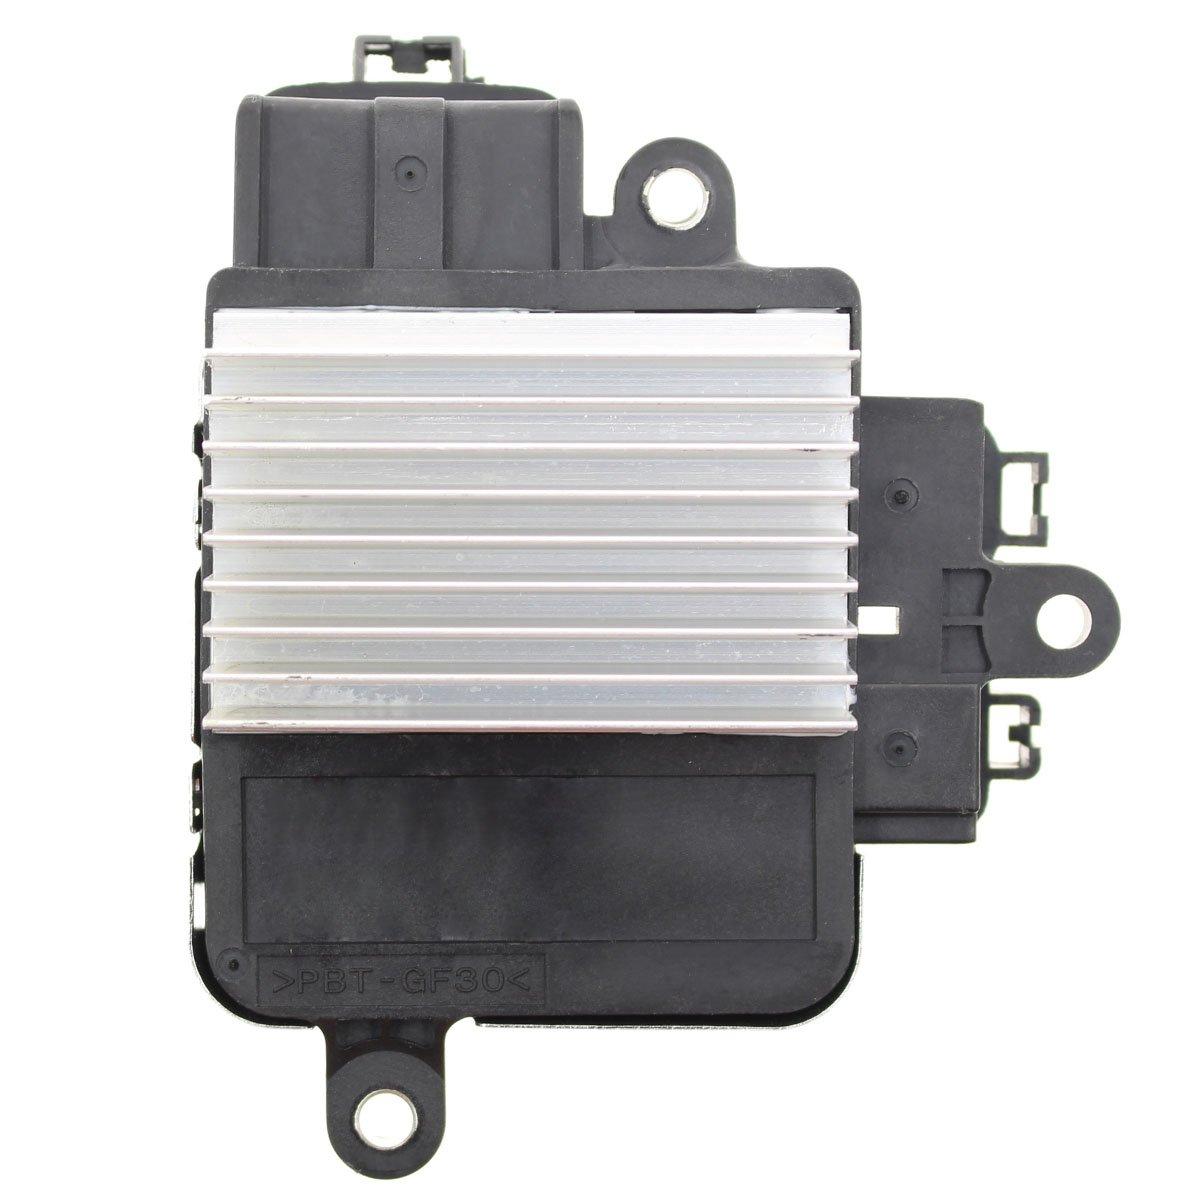 Amazon.com: AUTOKAY Radiator Cooling Fan Control Module Unit ECU for Toyota  RAV4 Sienna Lexus ES350: Automotive